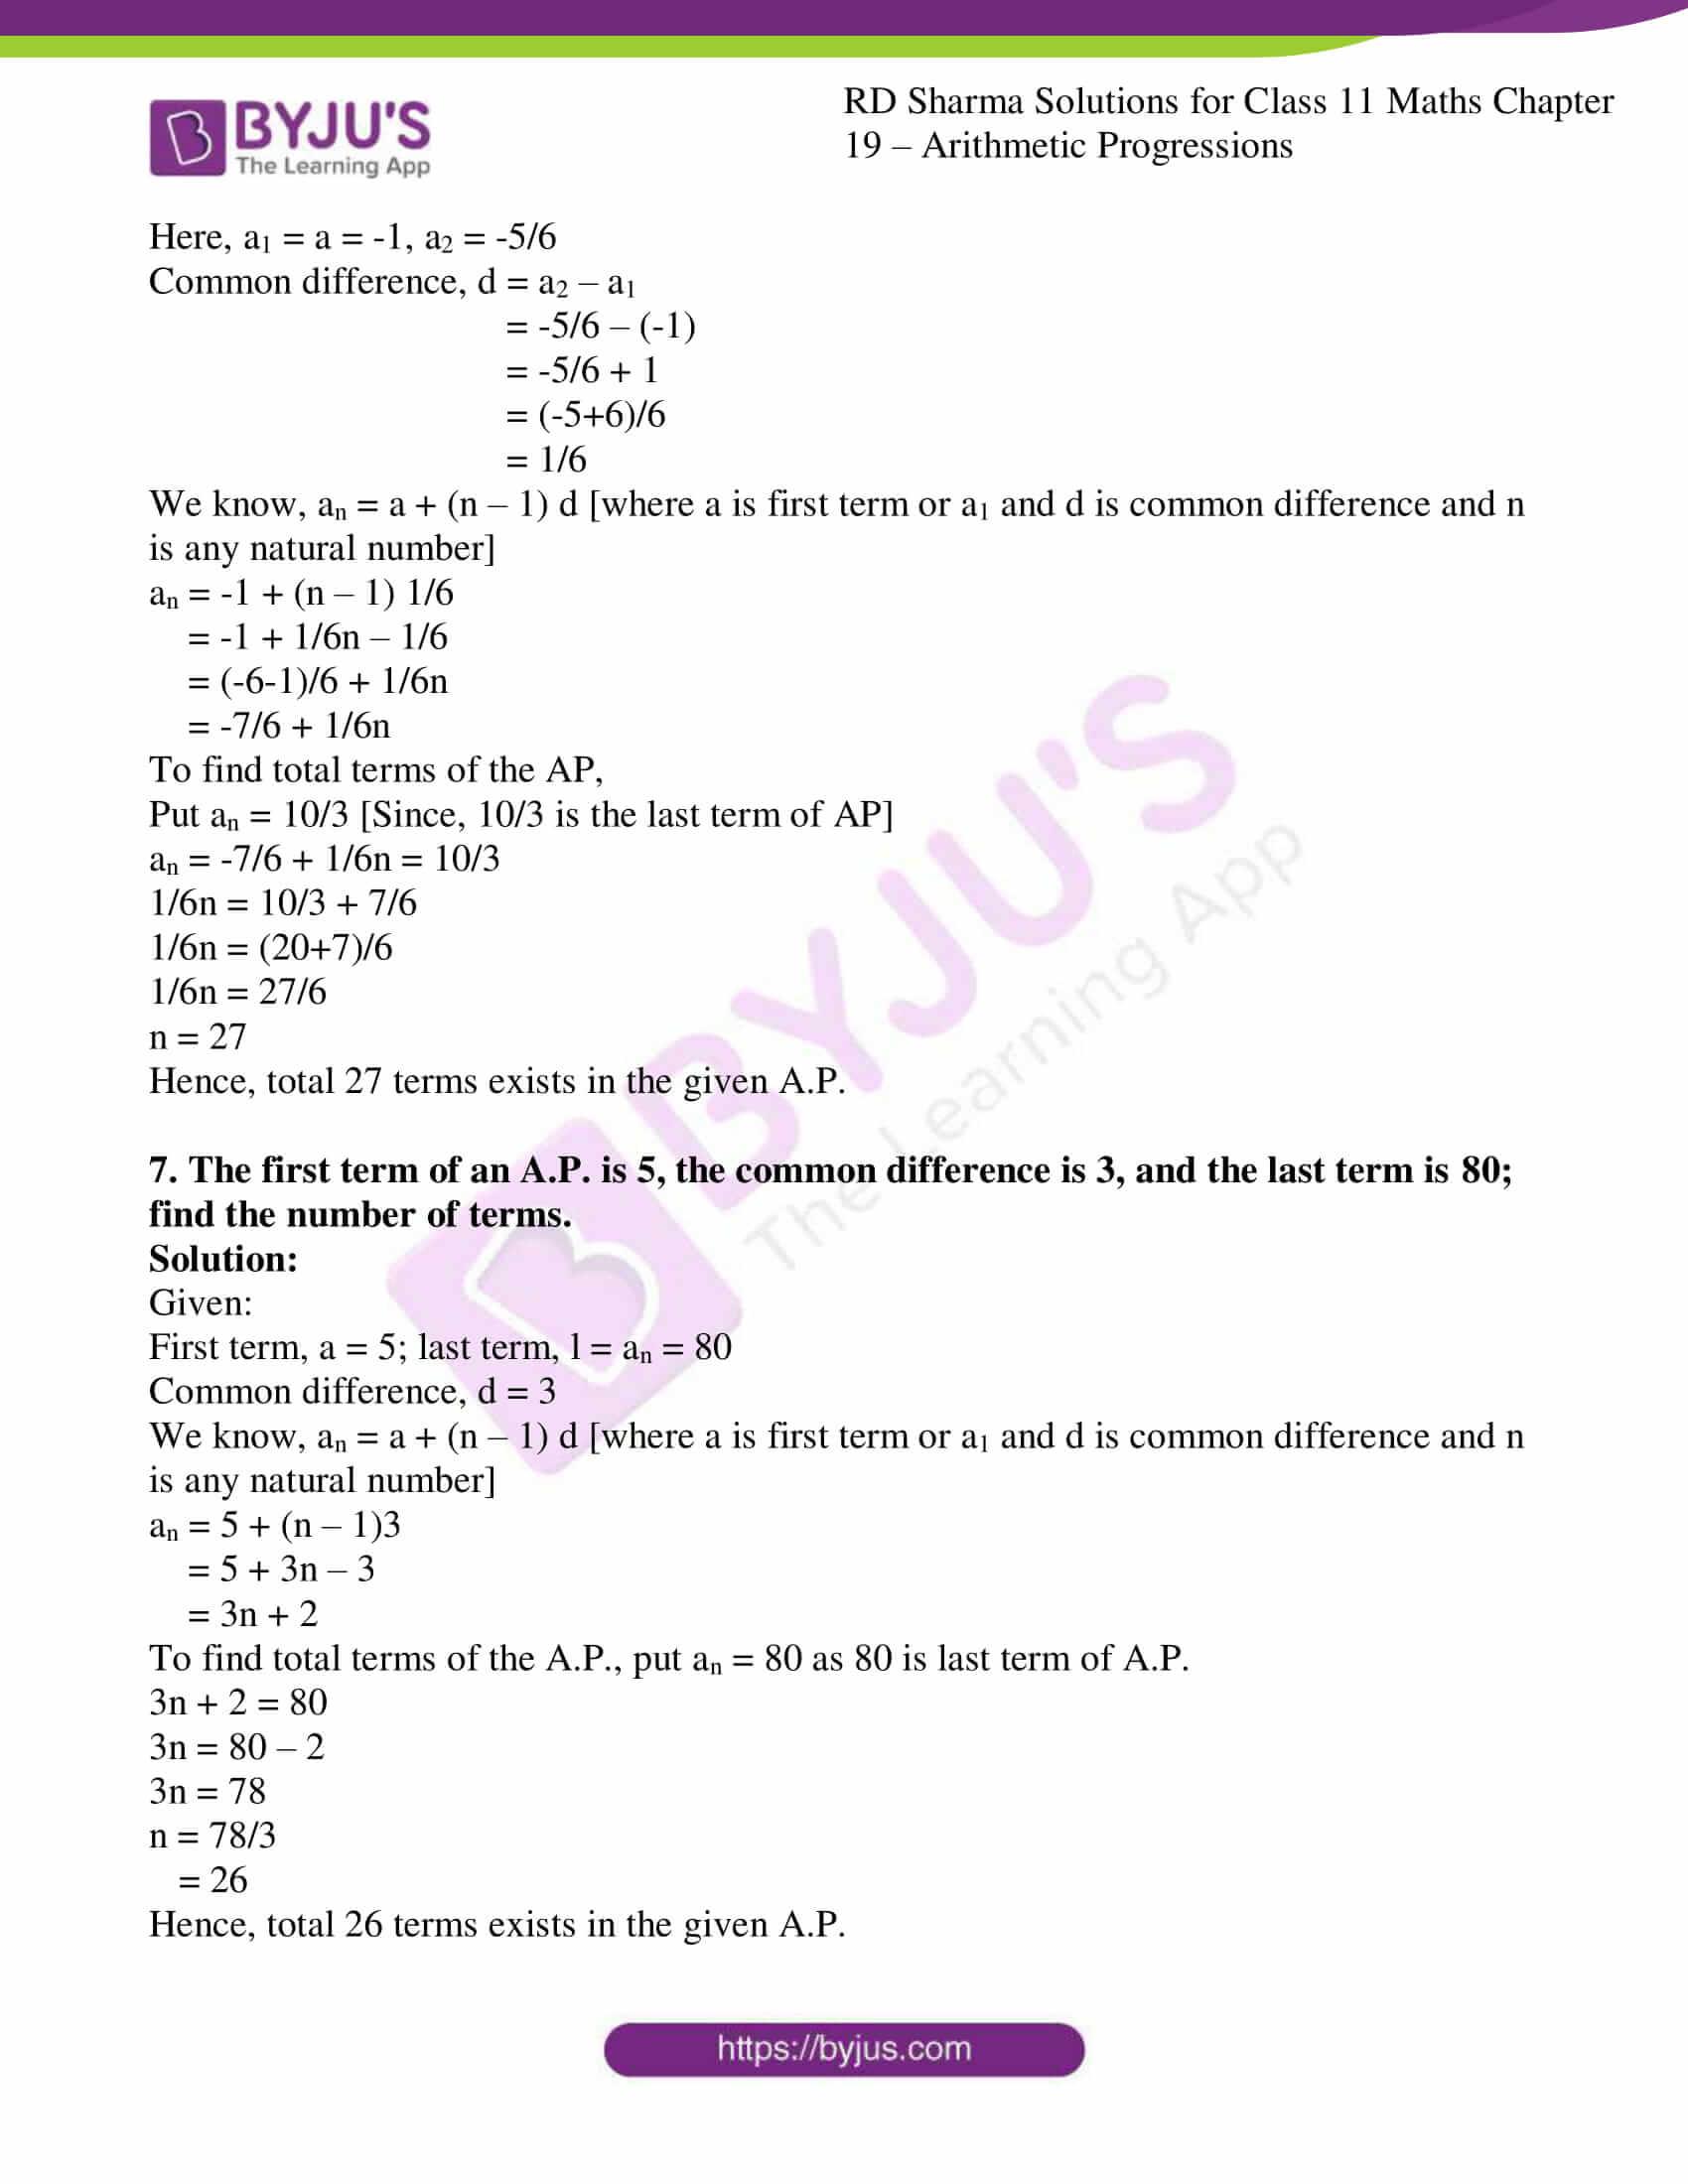 rd sharma class 11 maths ch 19 ex 2 07